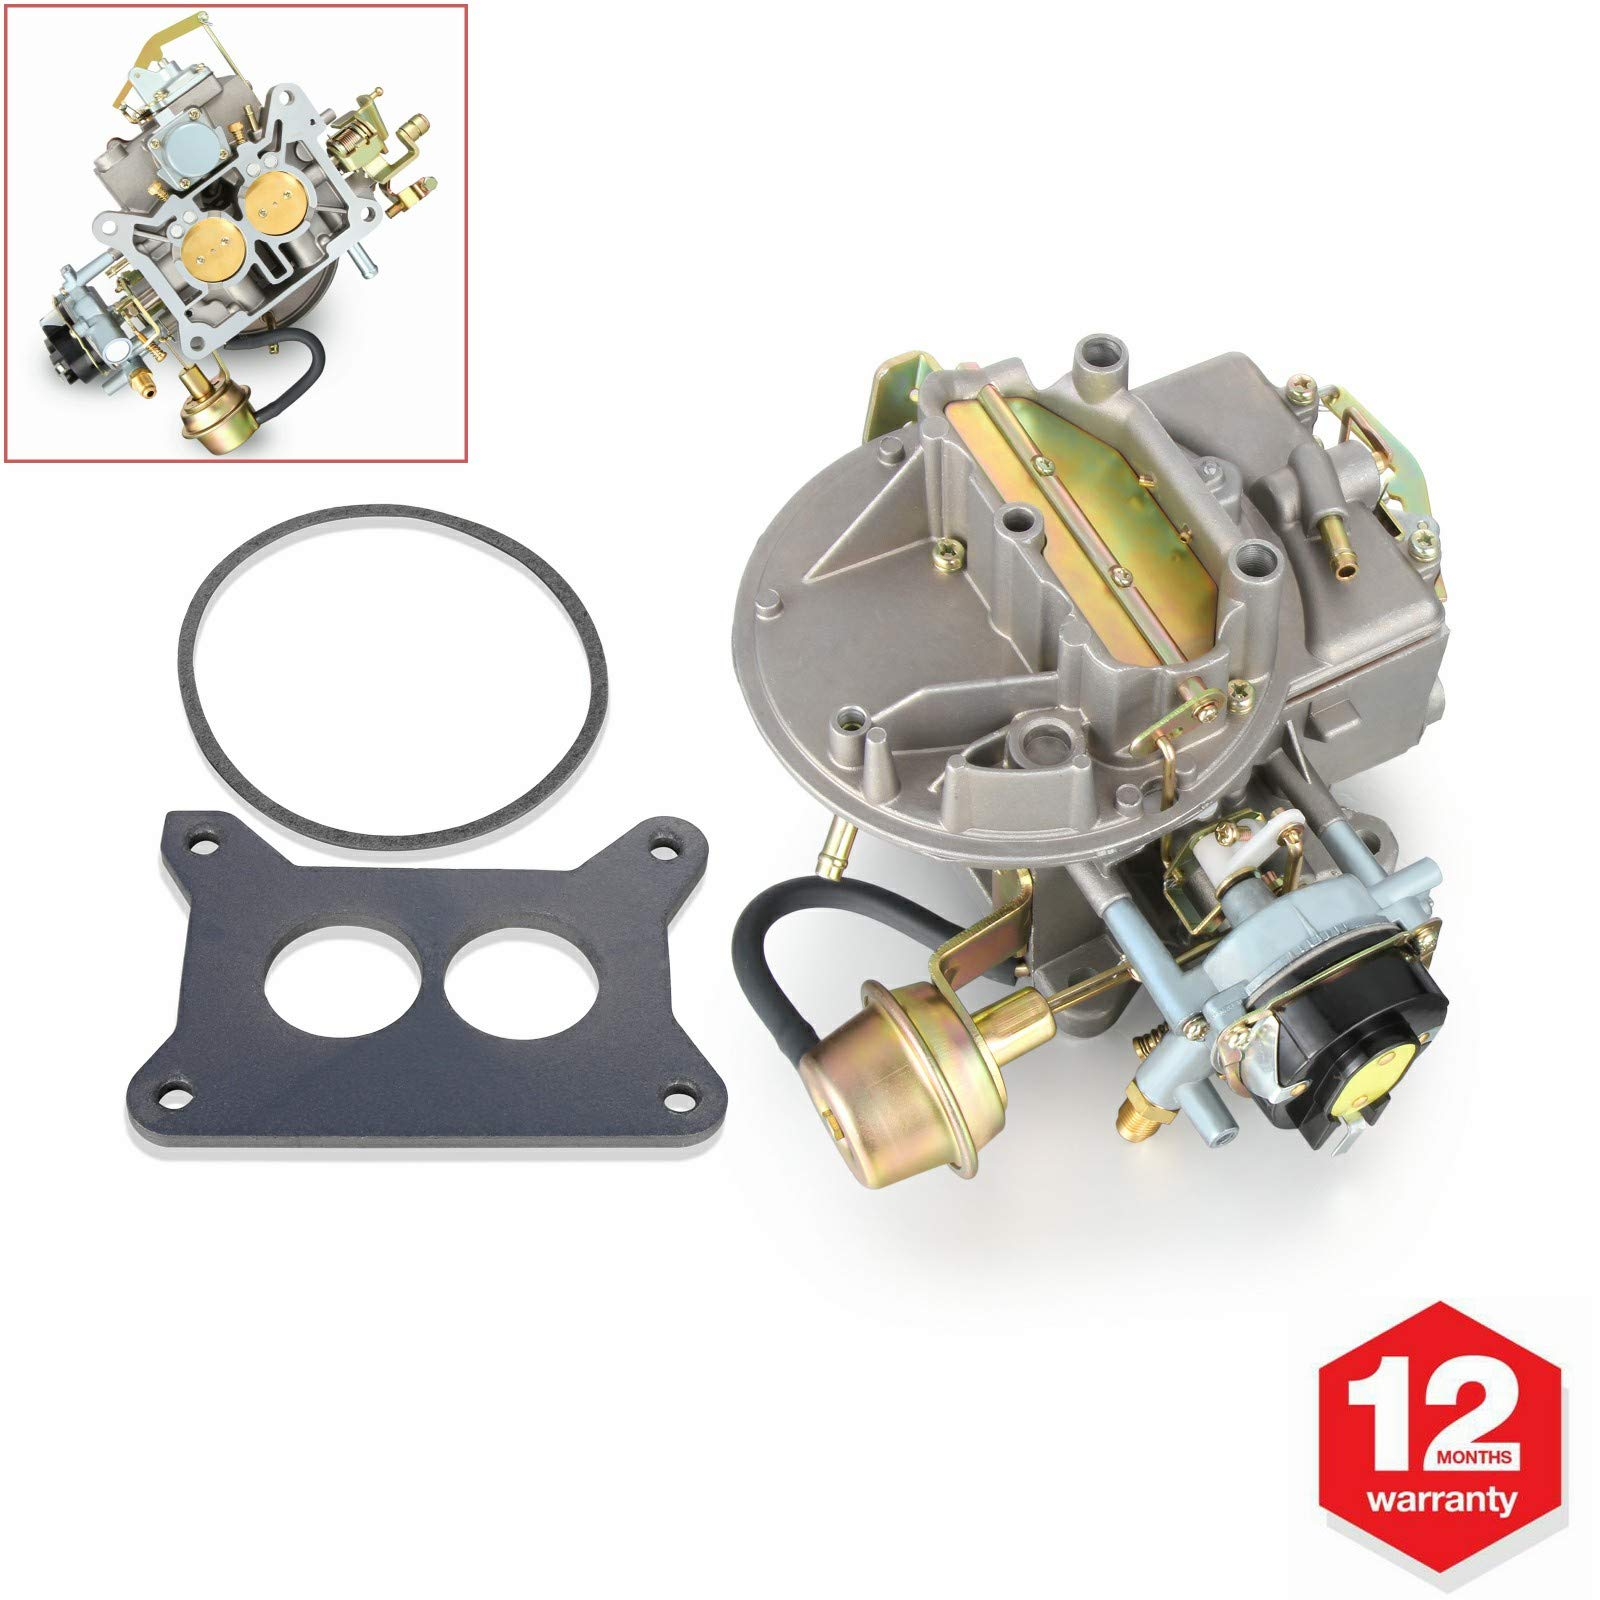 Twilight Garage 2 Barrel Carburetor Carb 2100 A800 For Ford 289 302 351 Cu Jeep 360 Engine (Automatic Choke)